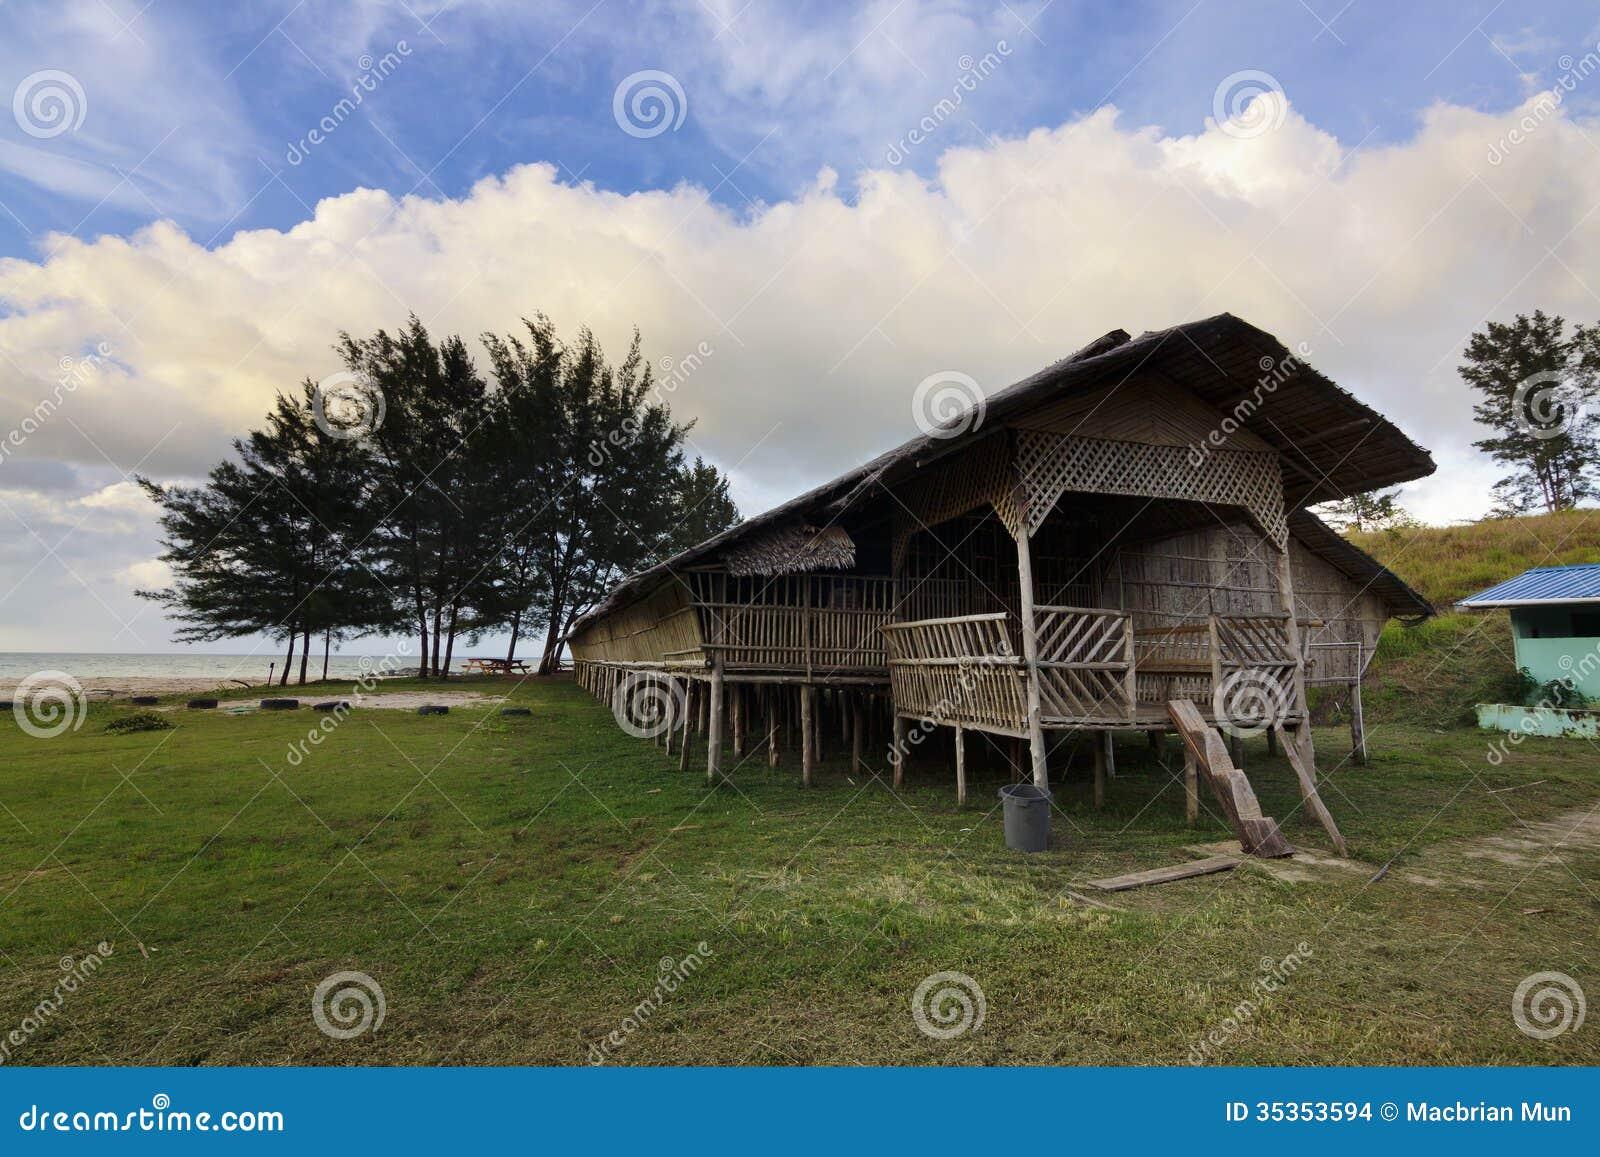 Traditional Wooden Longhouse At Sabah Malaysia Stock